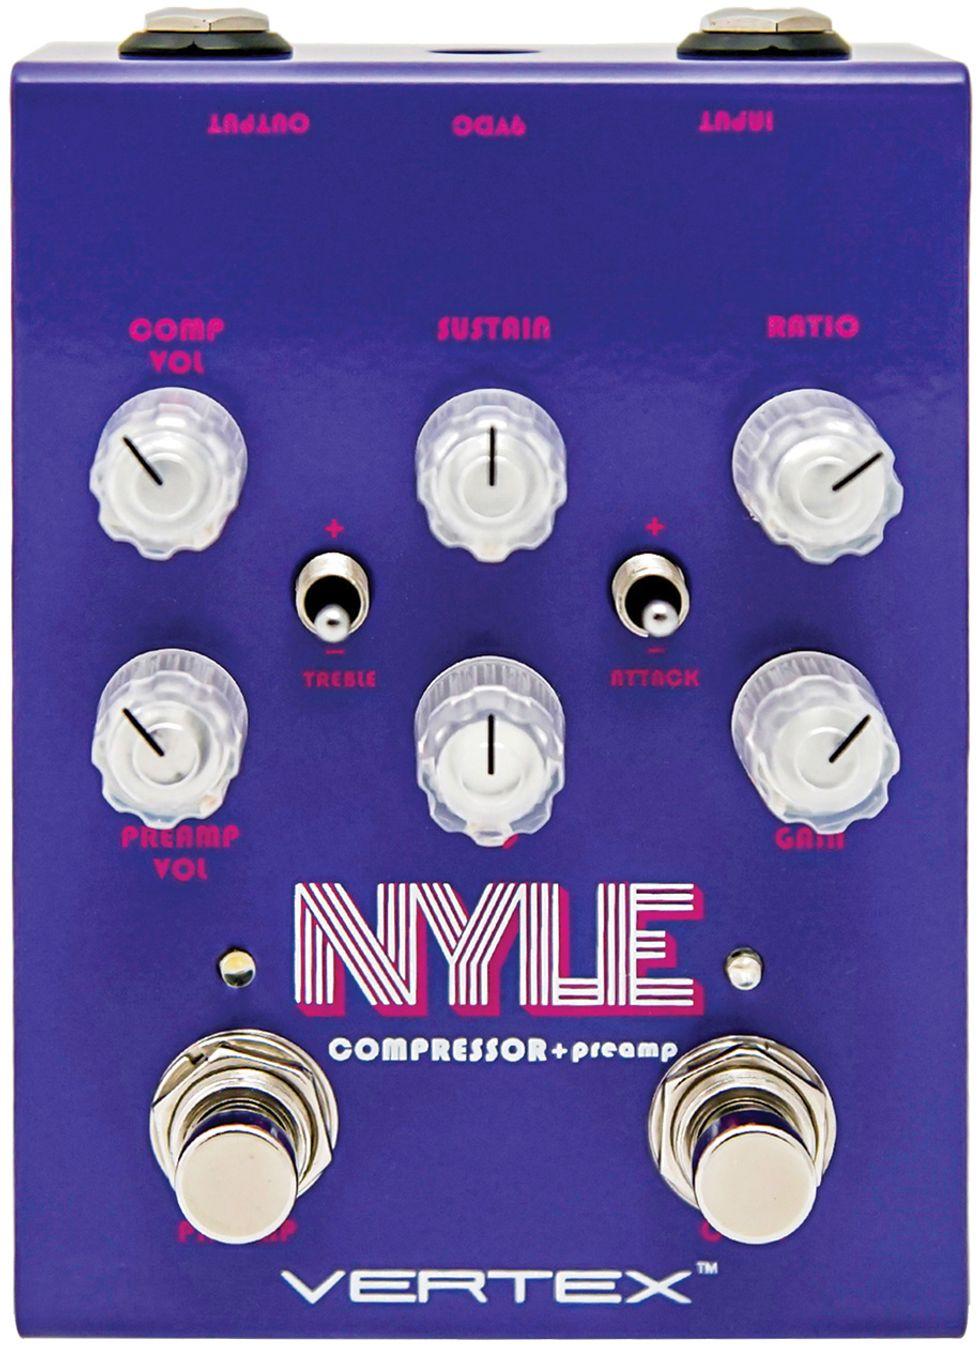 Vertex Nyle homepage